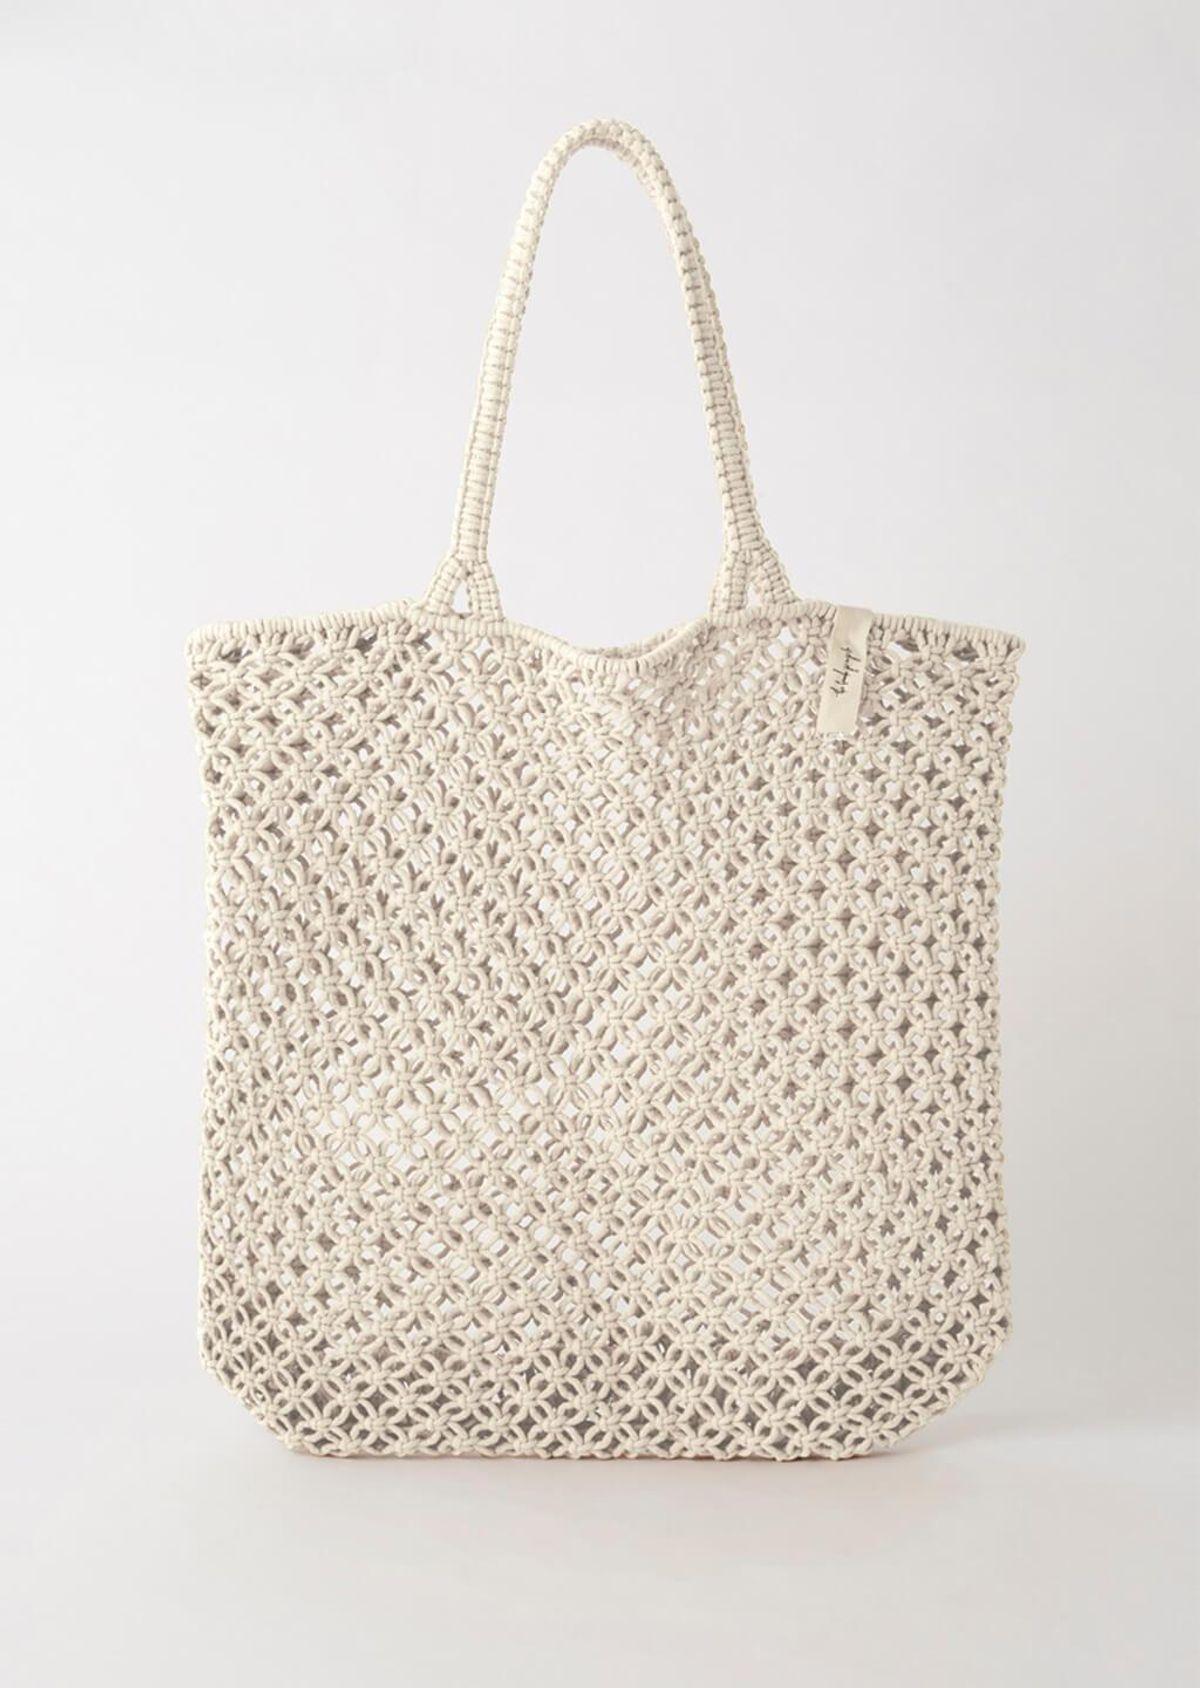 the beach people macrame tote bag